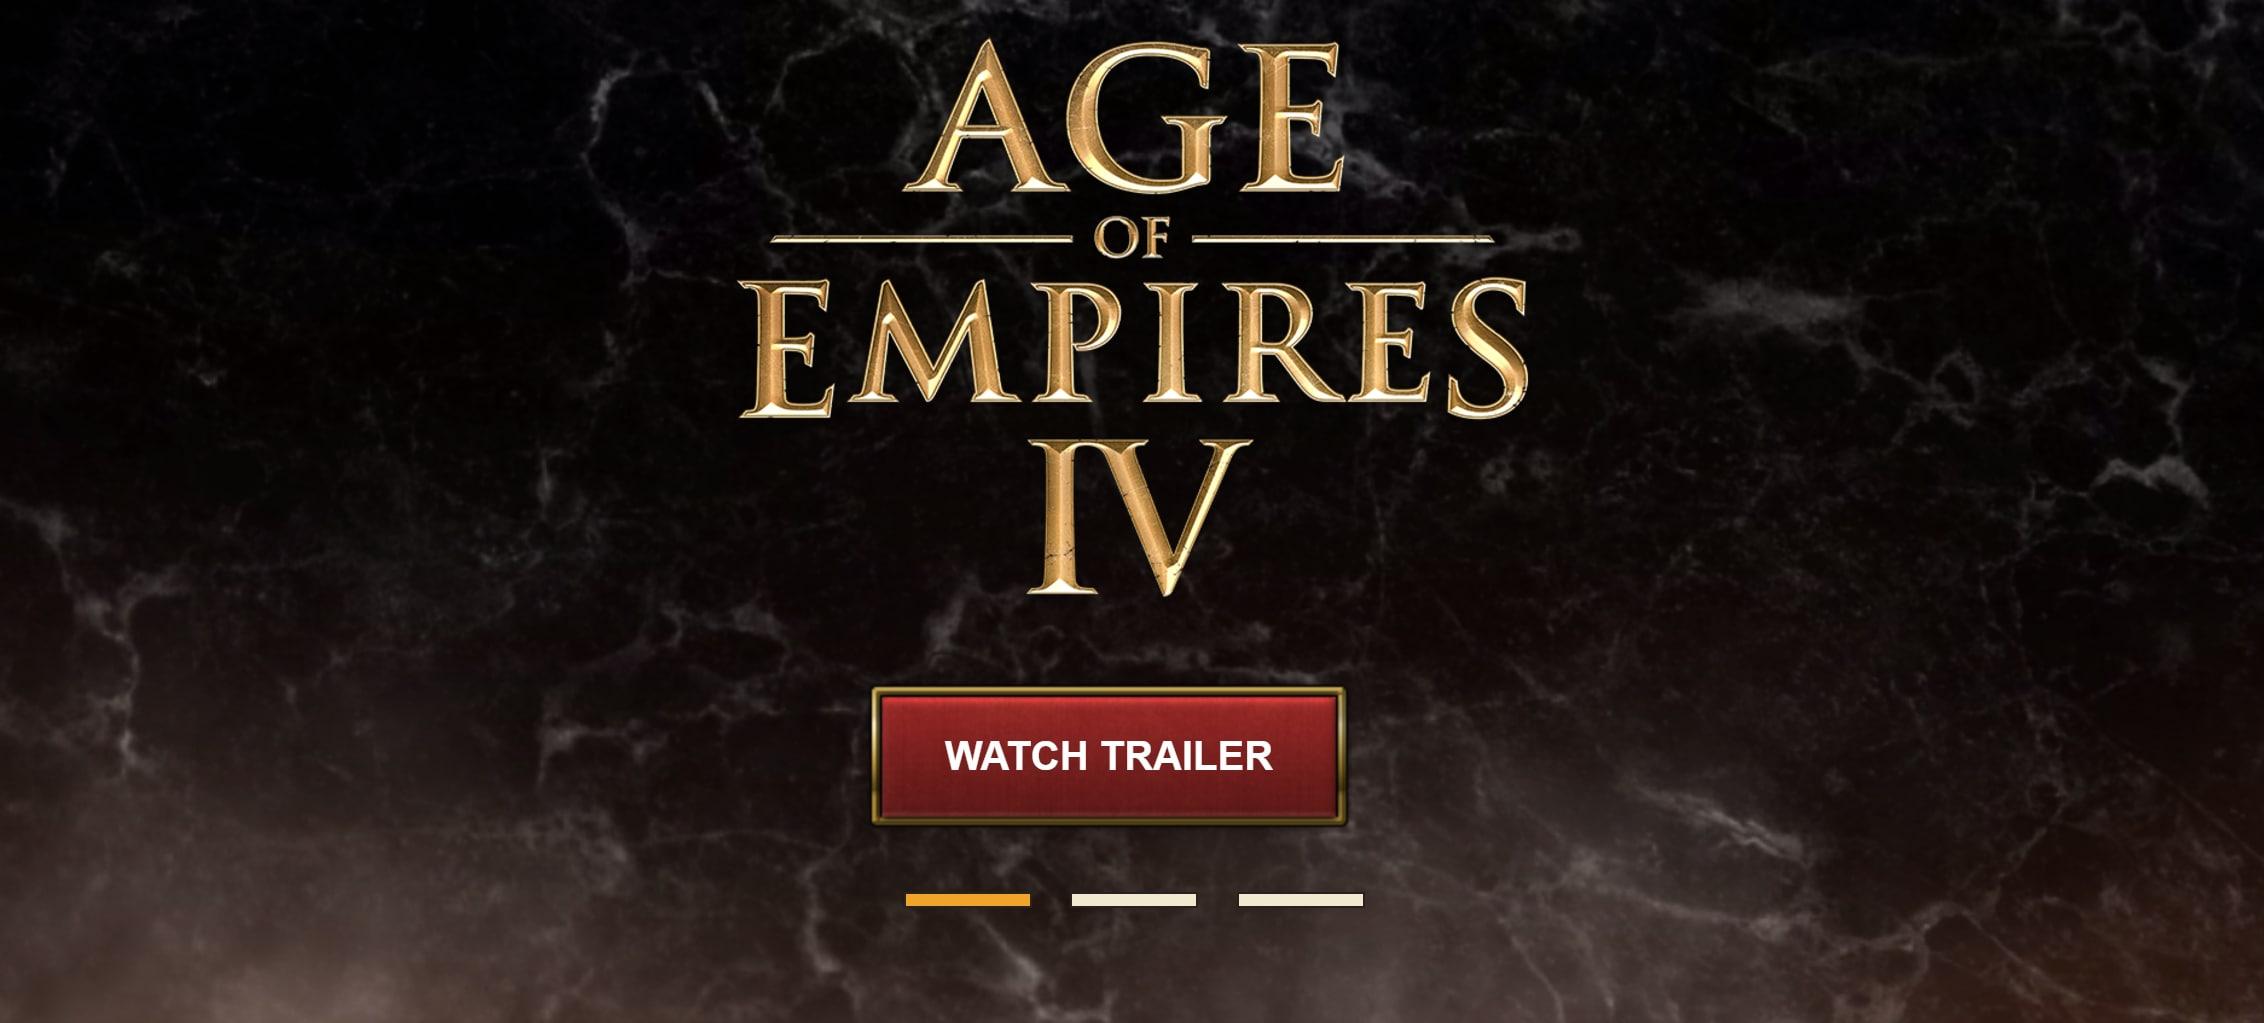 Age of empires ii Manual Espa ol